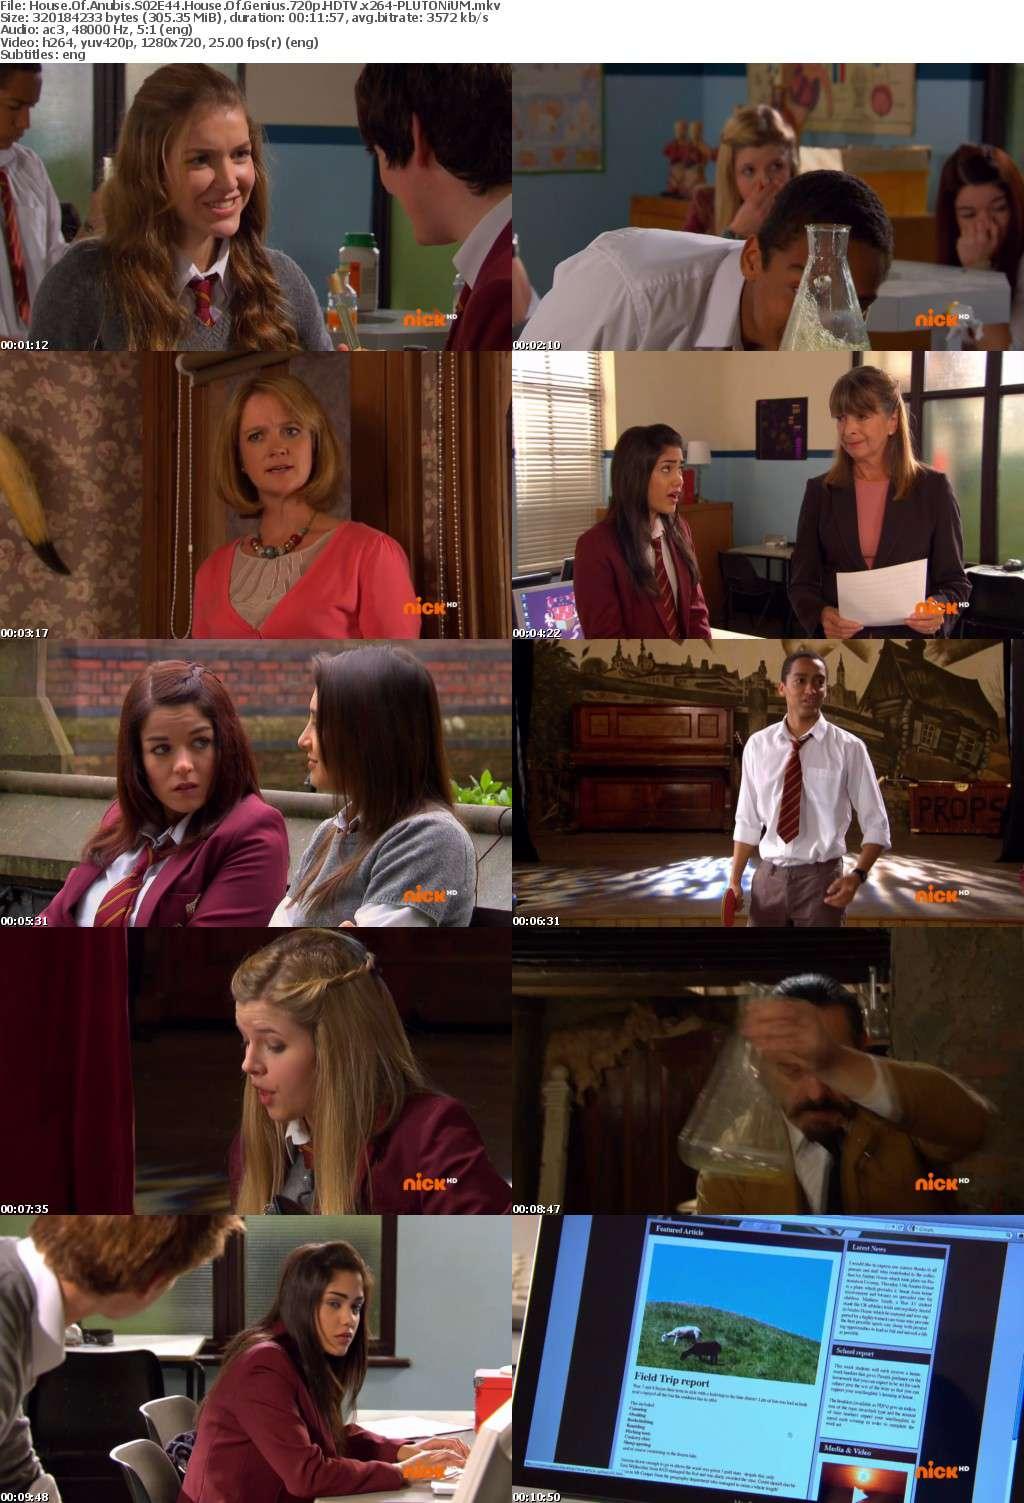 House Of Anubis S02E44 House Of Genius 720p HDTV x264-PLUTONiUM